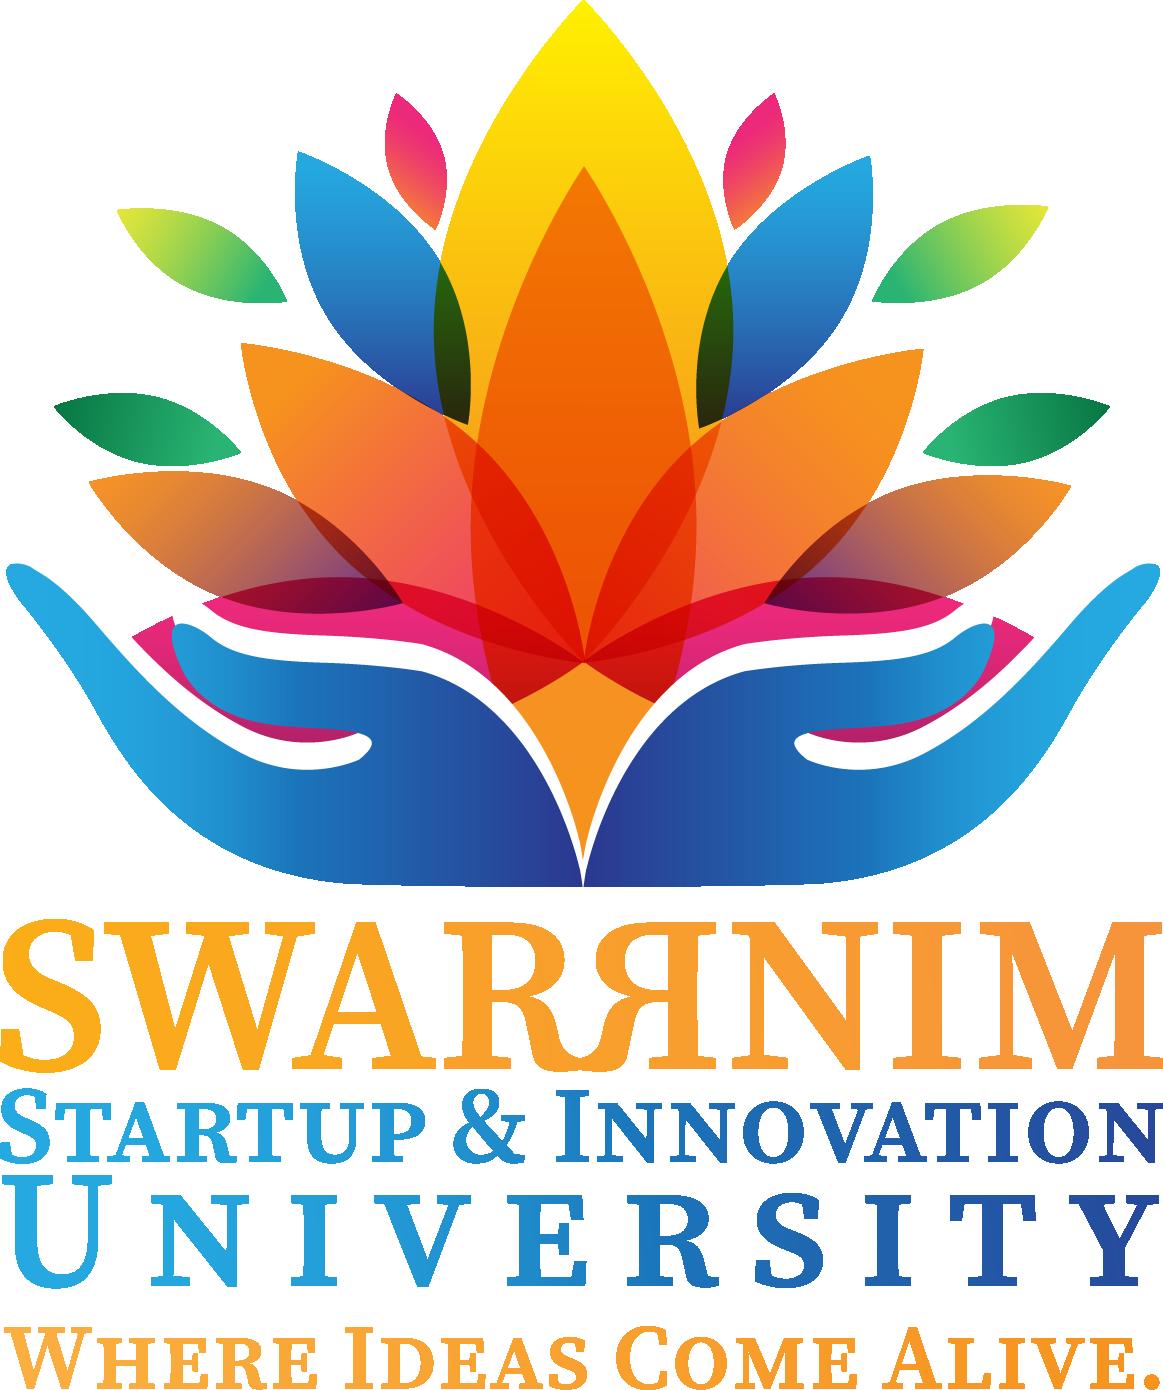 Swarnim Startup & Innovation University - SSIU